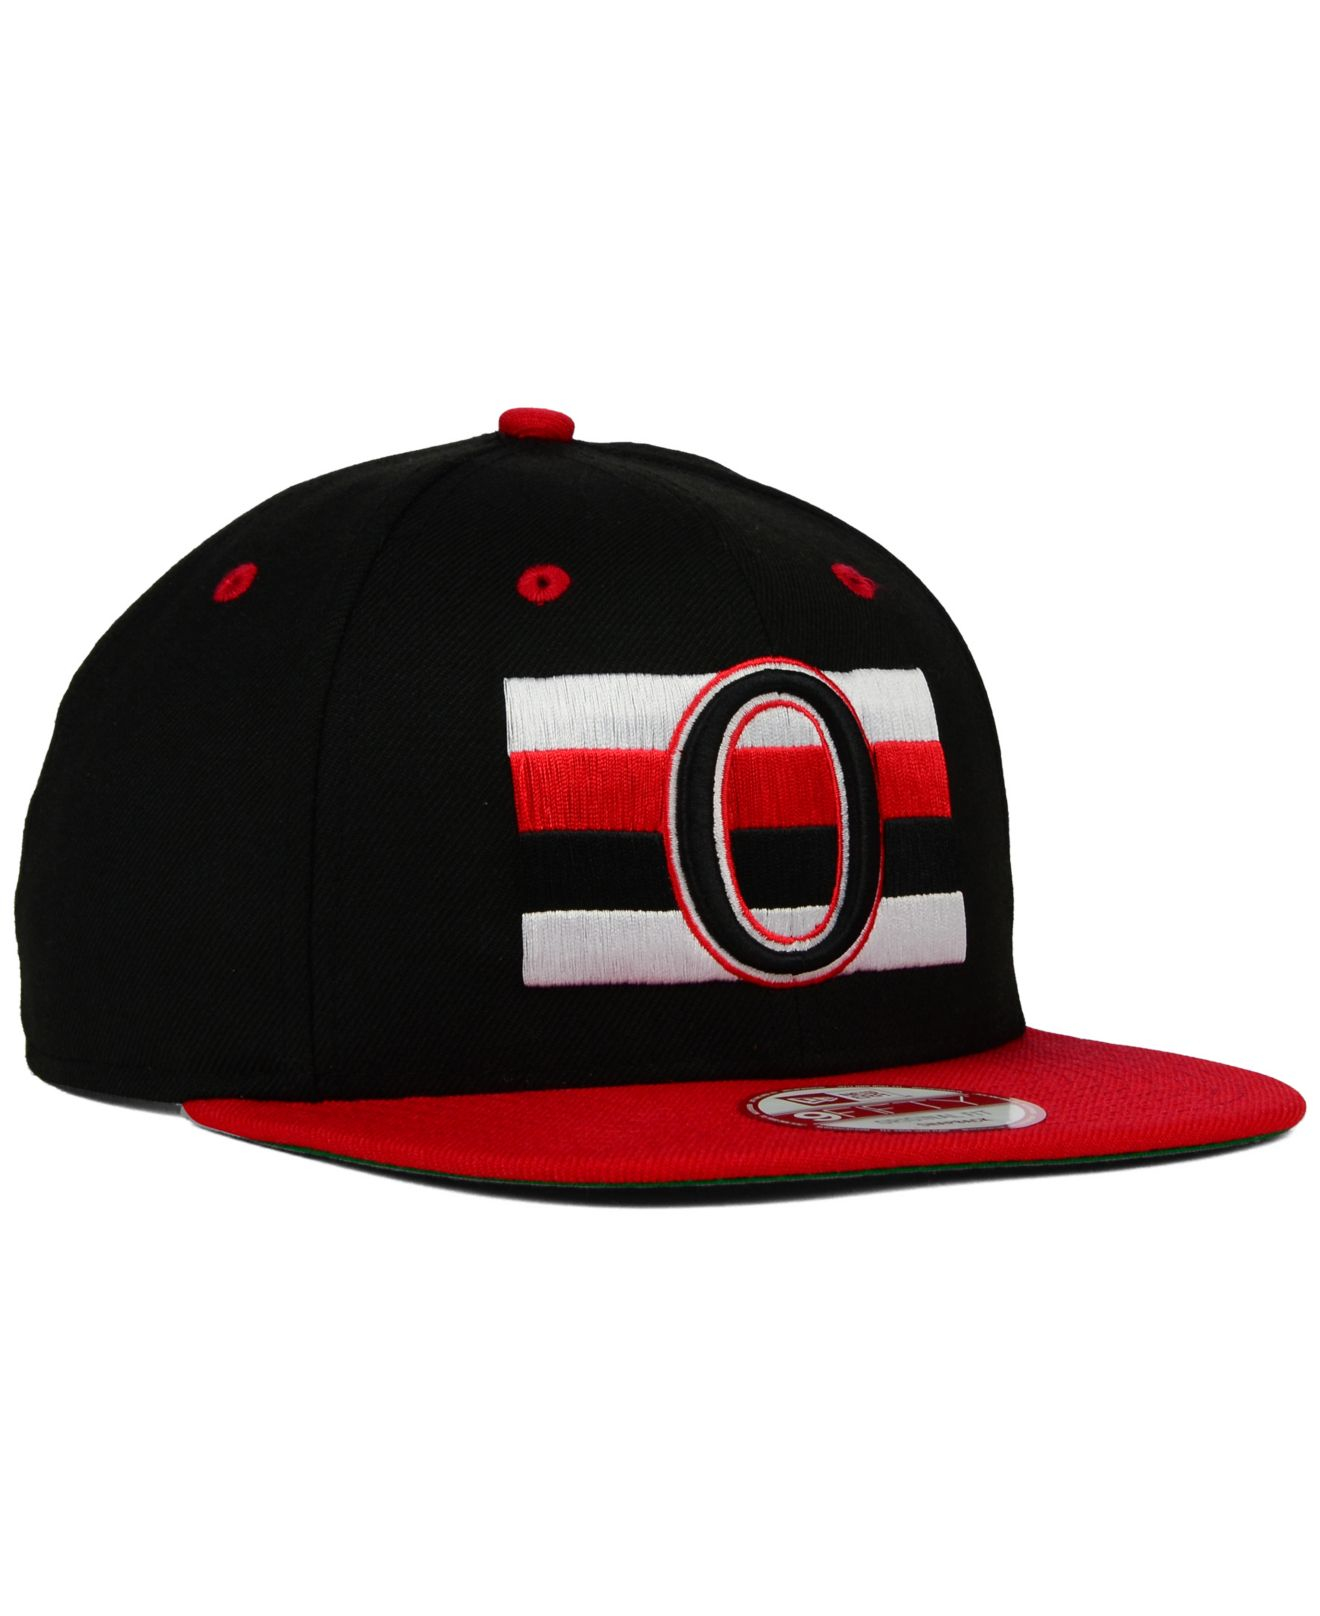 finest selection 3bb71 a5e60 KTZ Ottawa Senators Vintage 2-tone 9fifty Snapback Cap in Black for ...